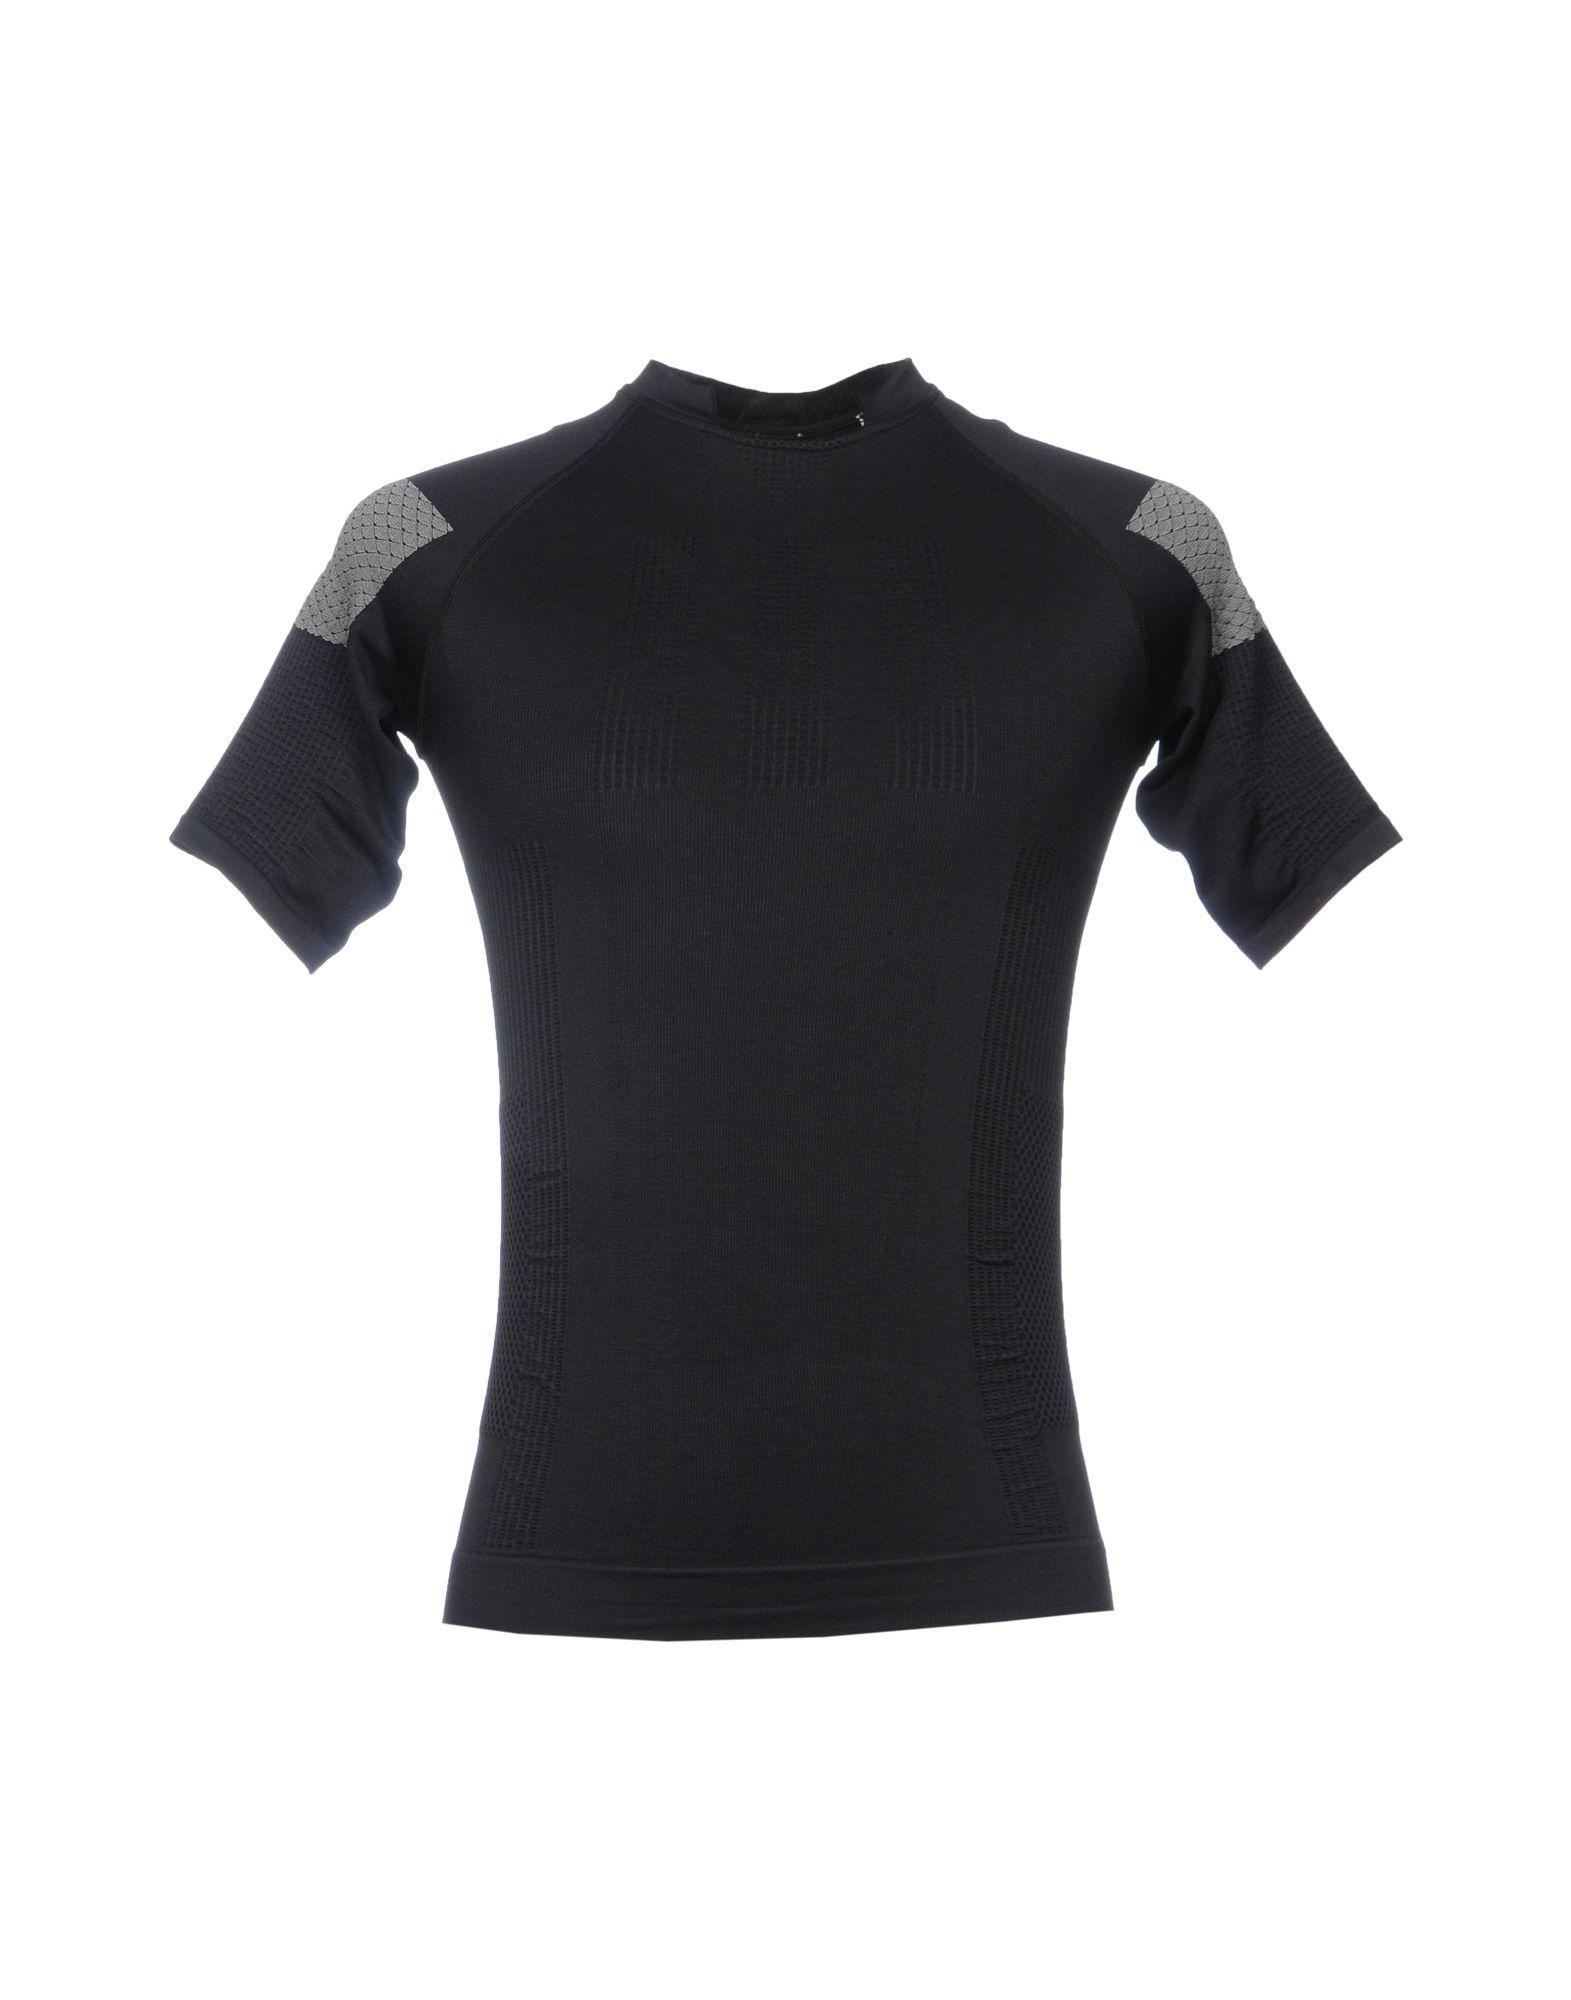 Adidas Originals T-shirts In Black